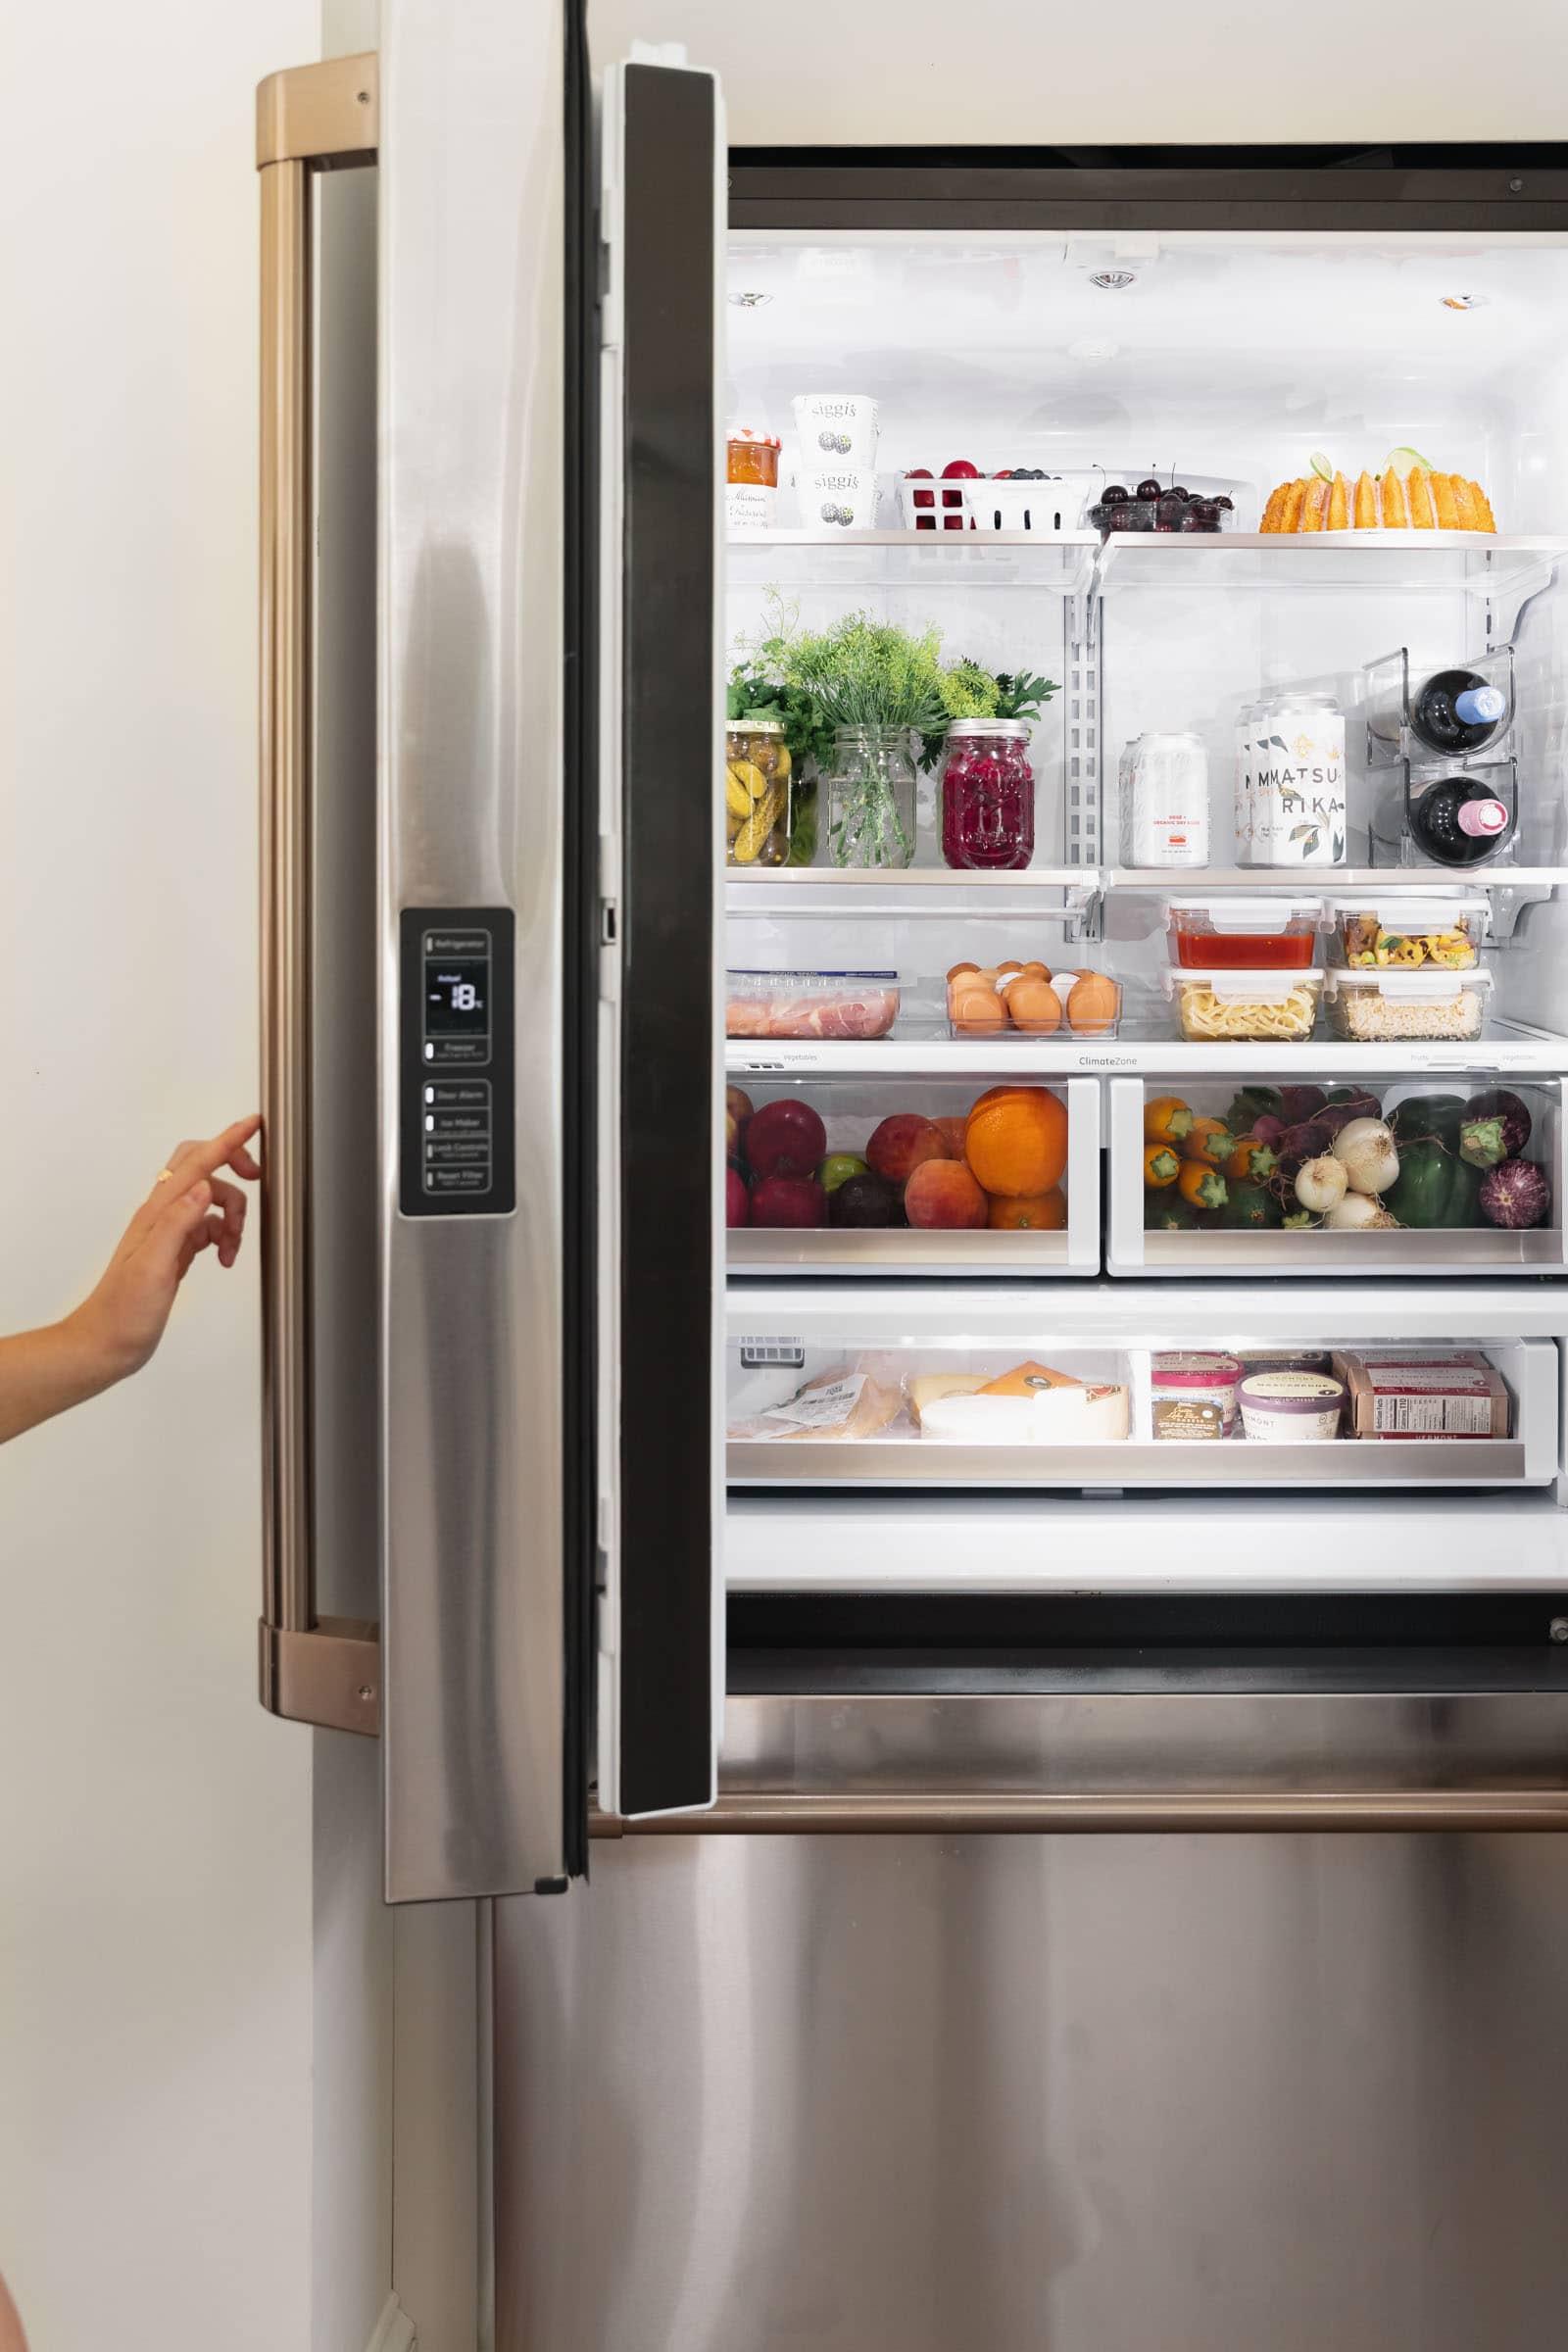 cafe appliances stainless steel fridge